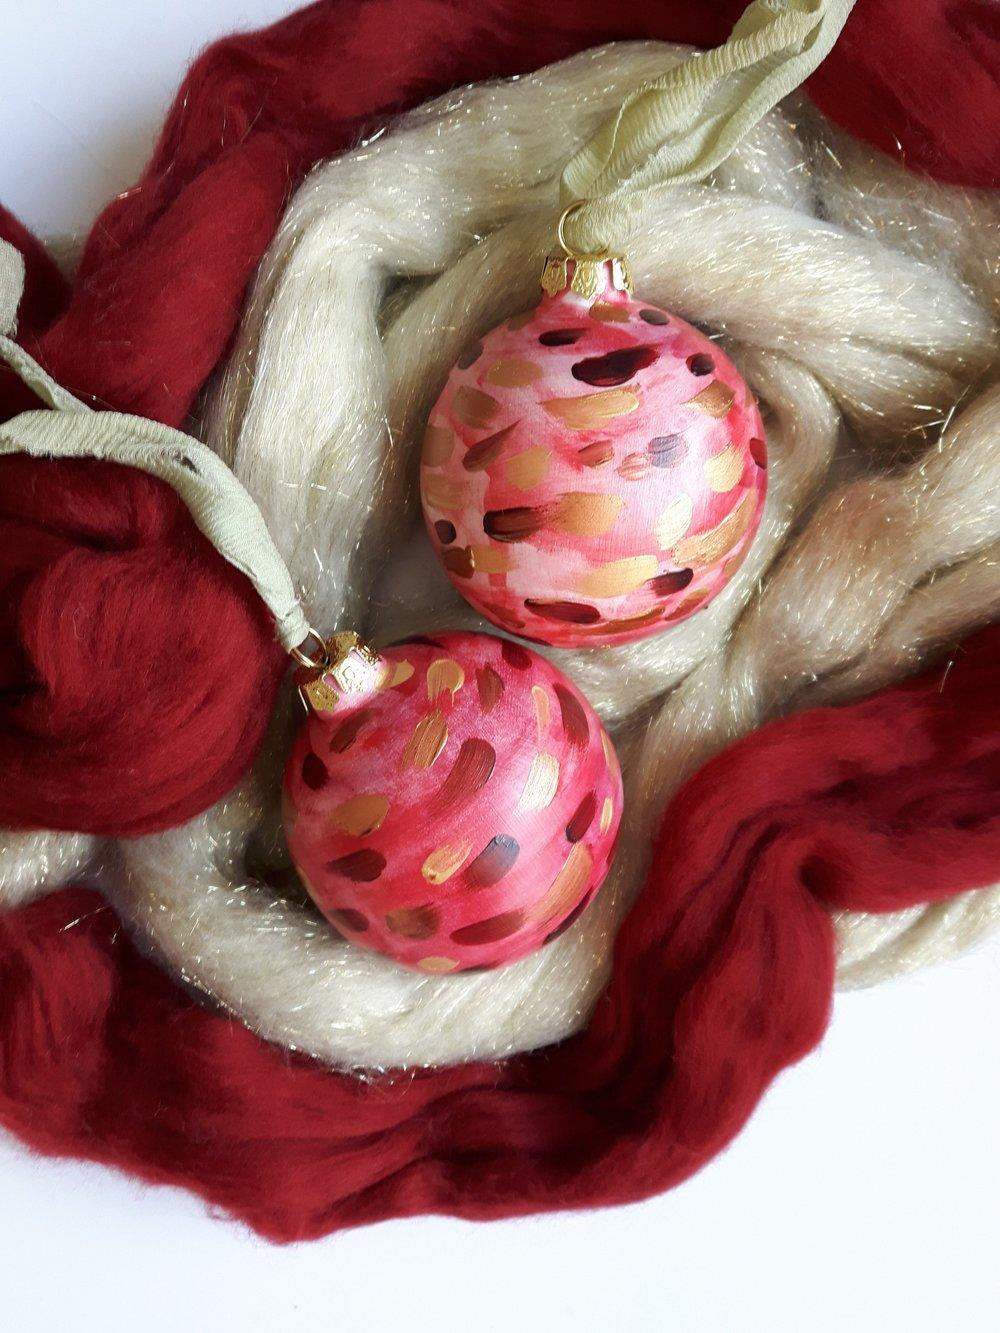 Flourishing Pointsettia Globe Ornament - $25.00